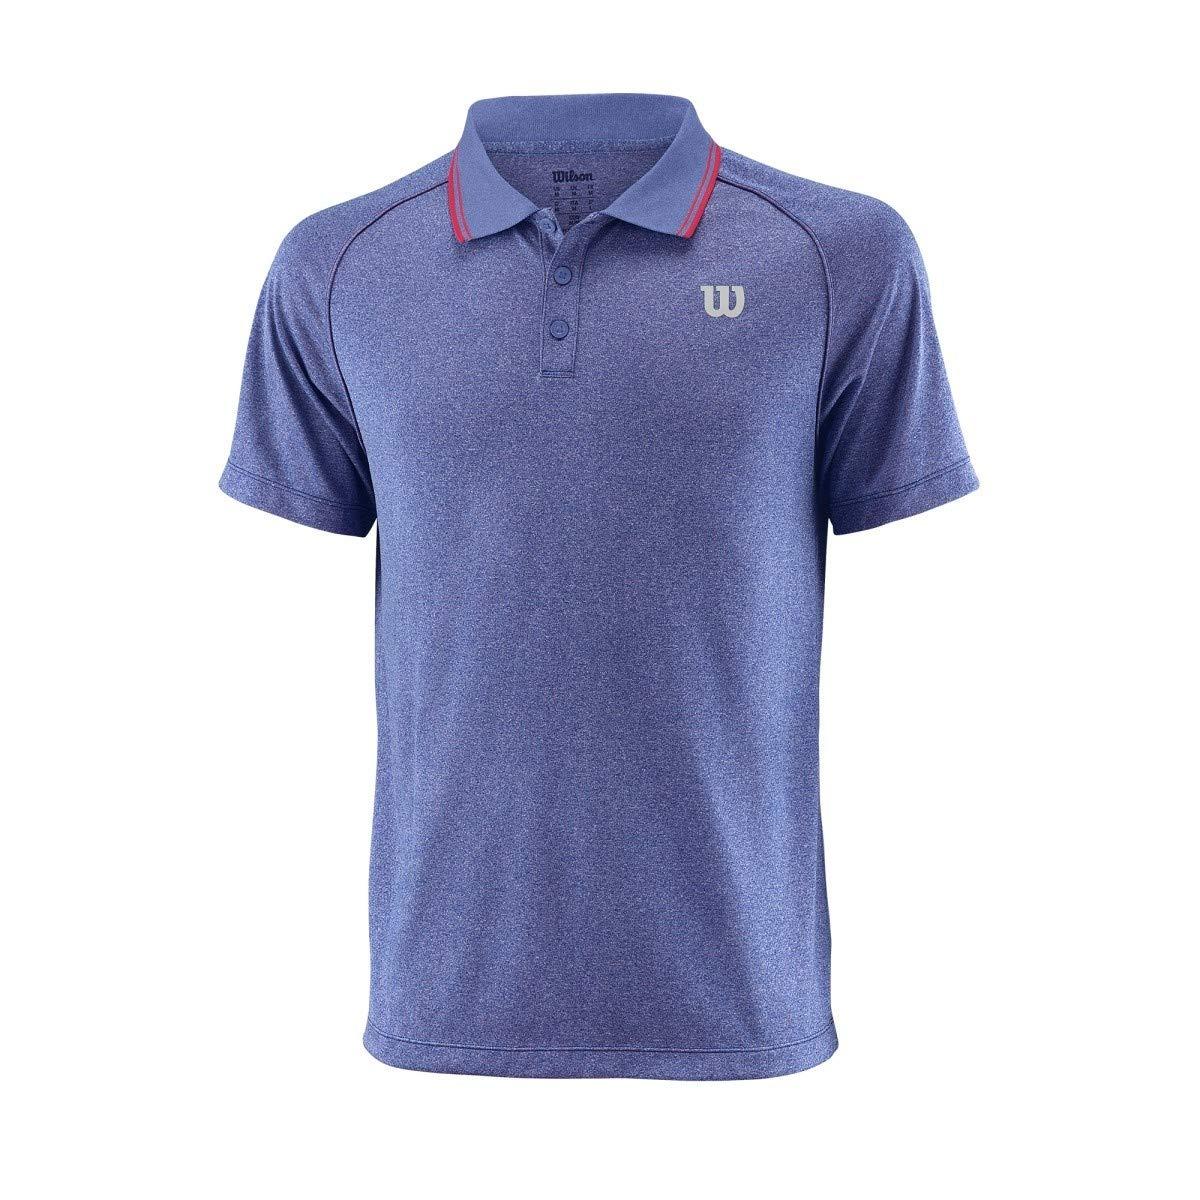 Wilson M Core Polo - Polo, Hombre, Azul(Mazarine Blue./Neon Red ...